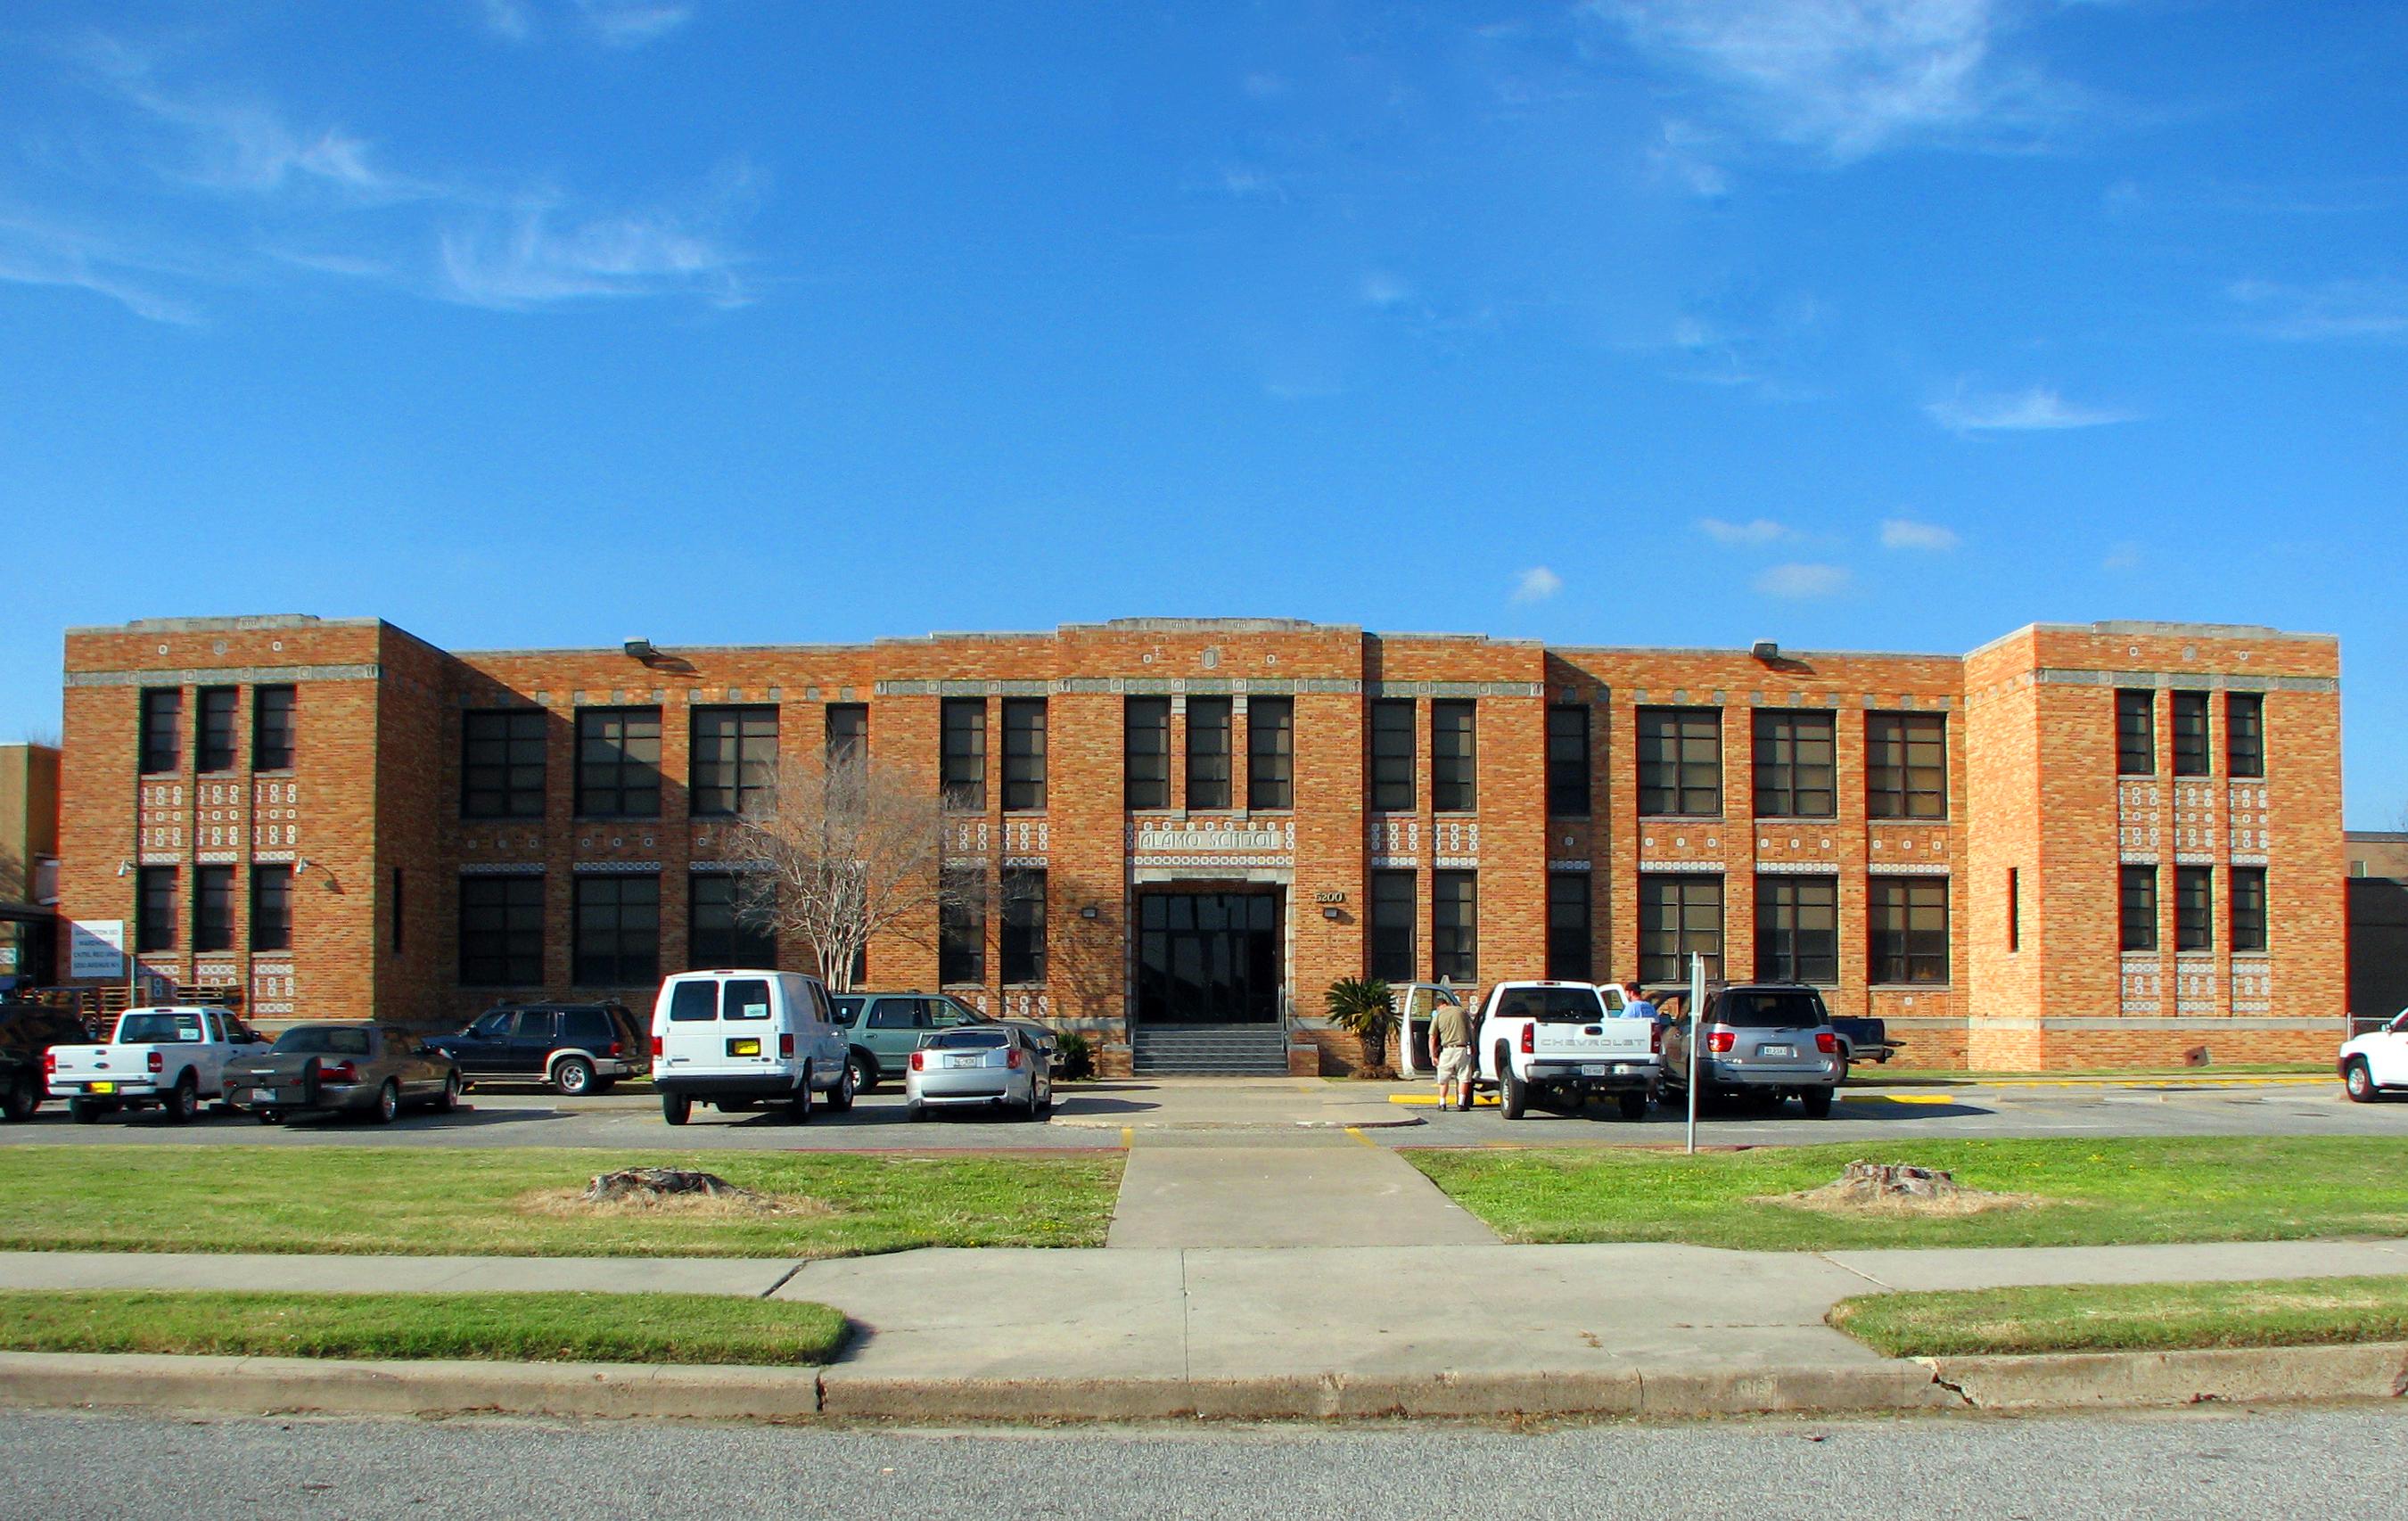 File:Alamo School Galveston post Ike.jpg